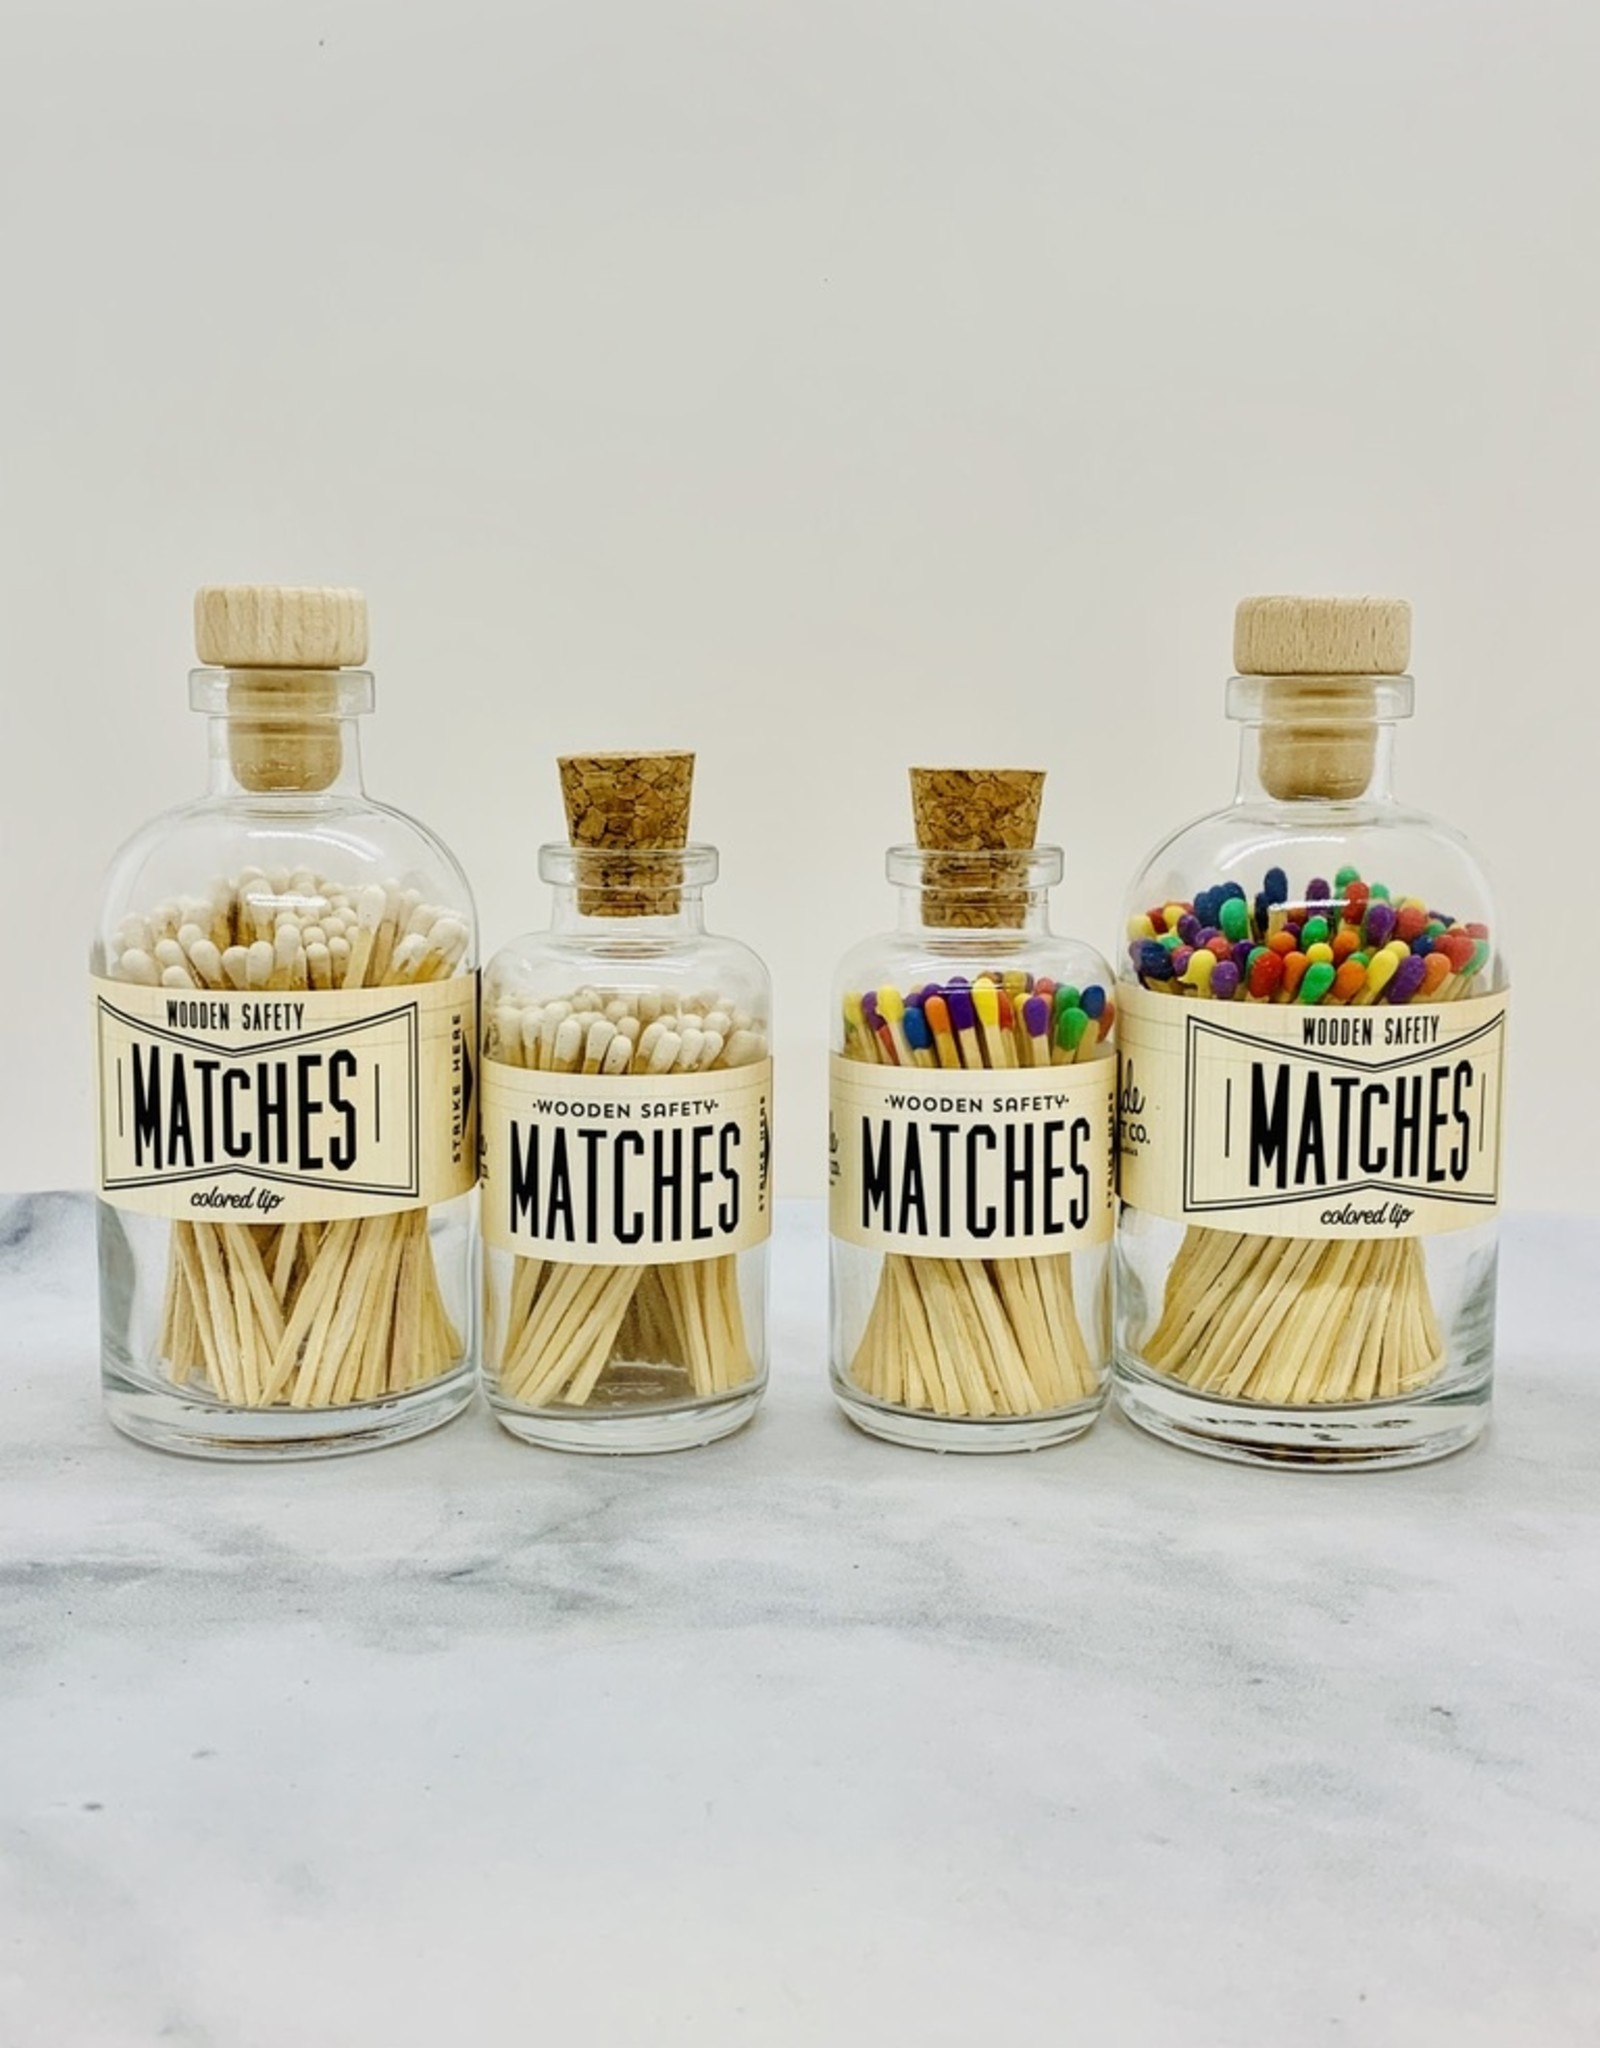 CREATIVECOOP Vintage Apothecary Matches